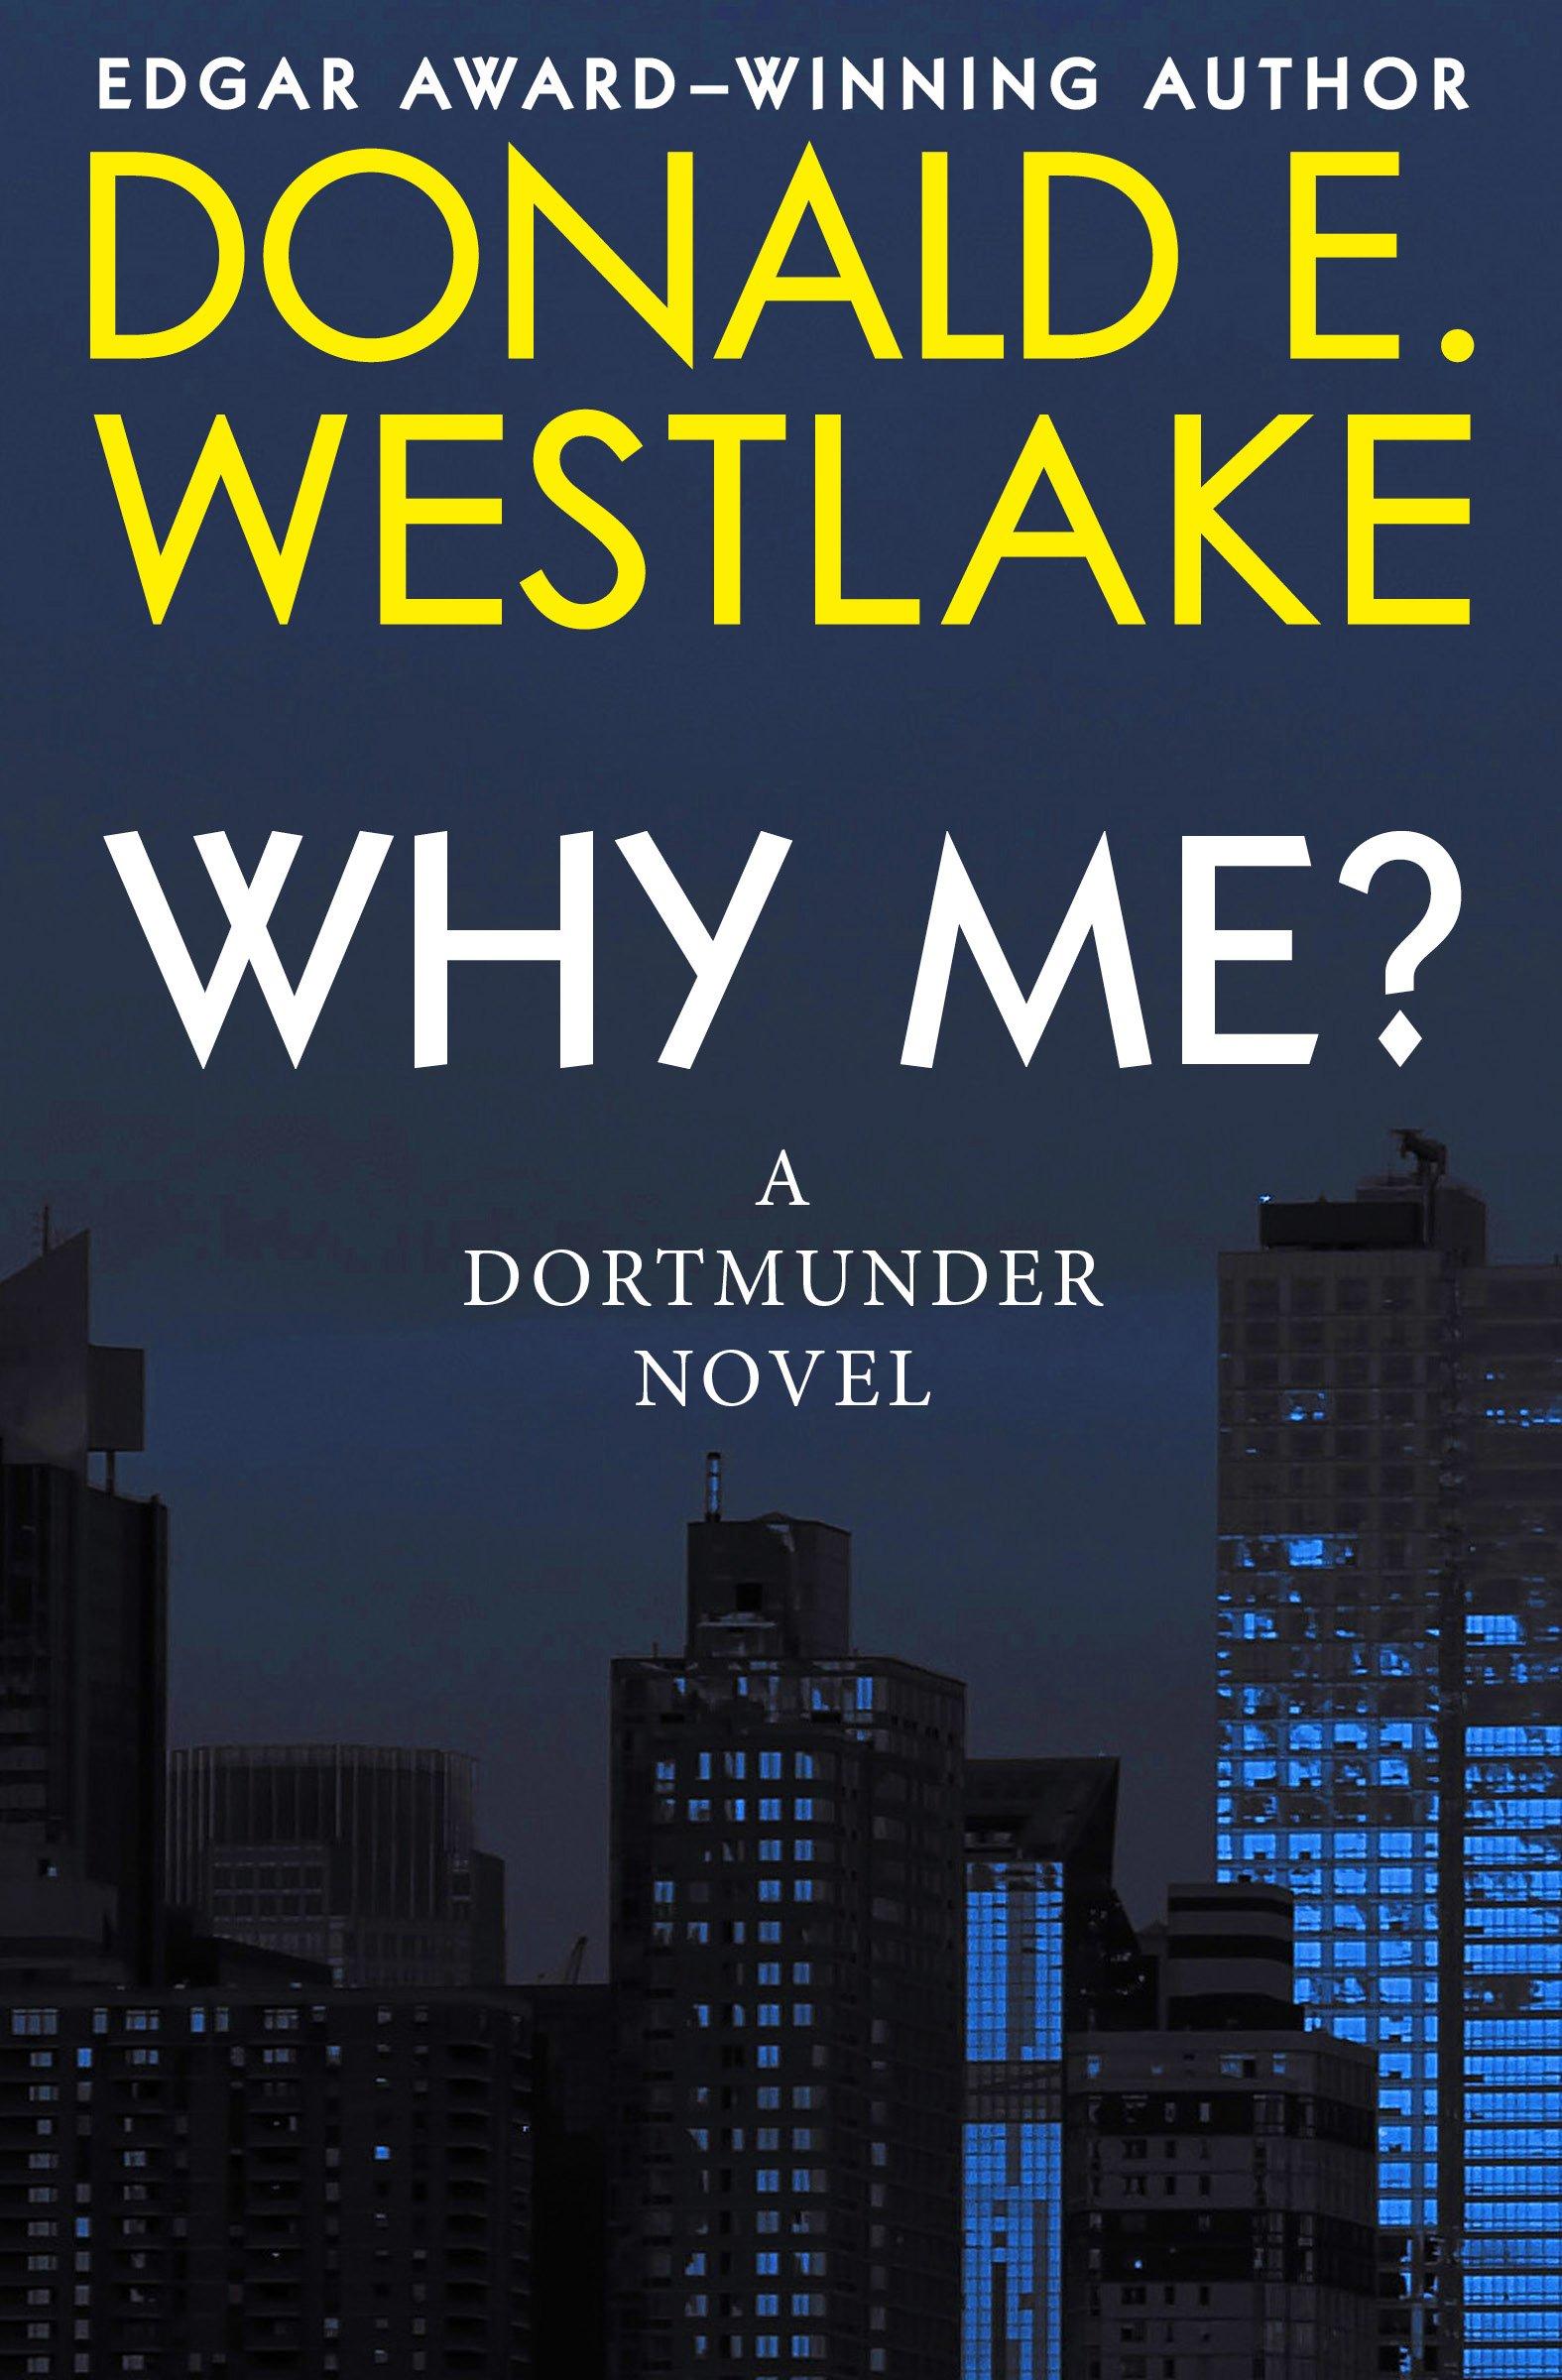 Why Me? (The Dortmunder Novels Book 5) (English Edition)